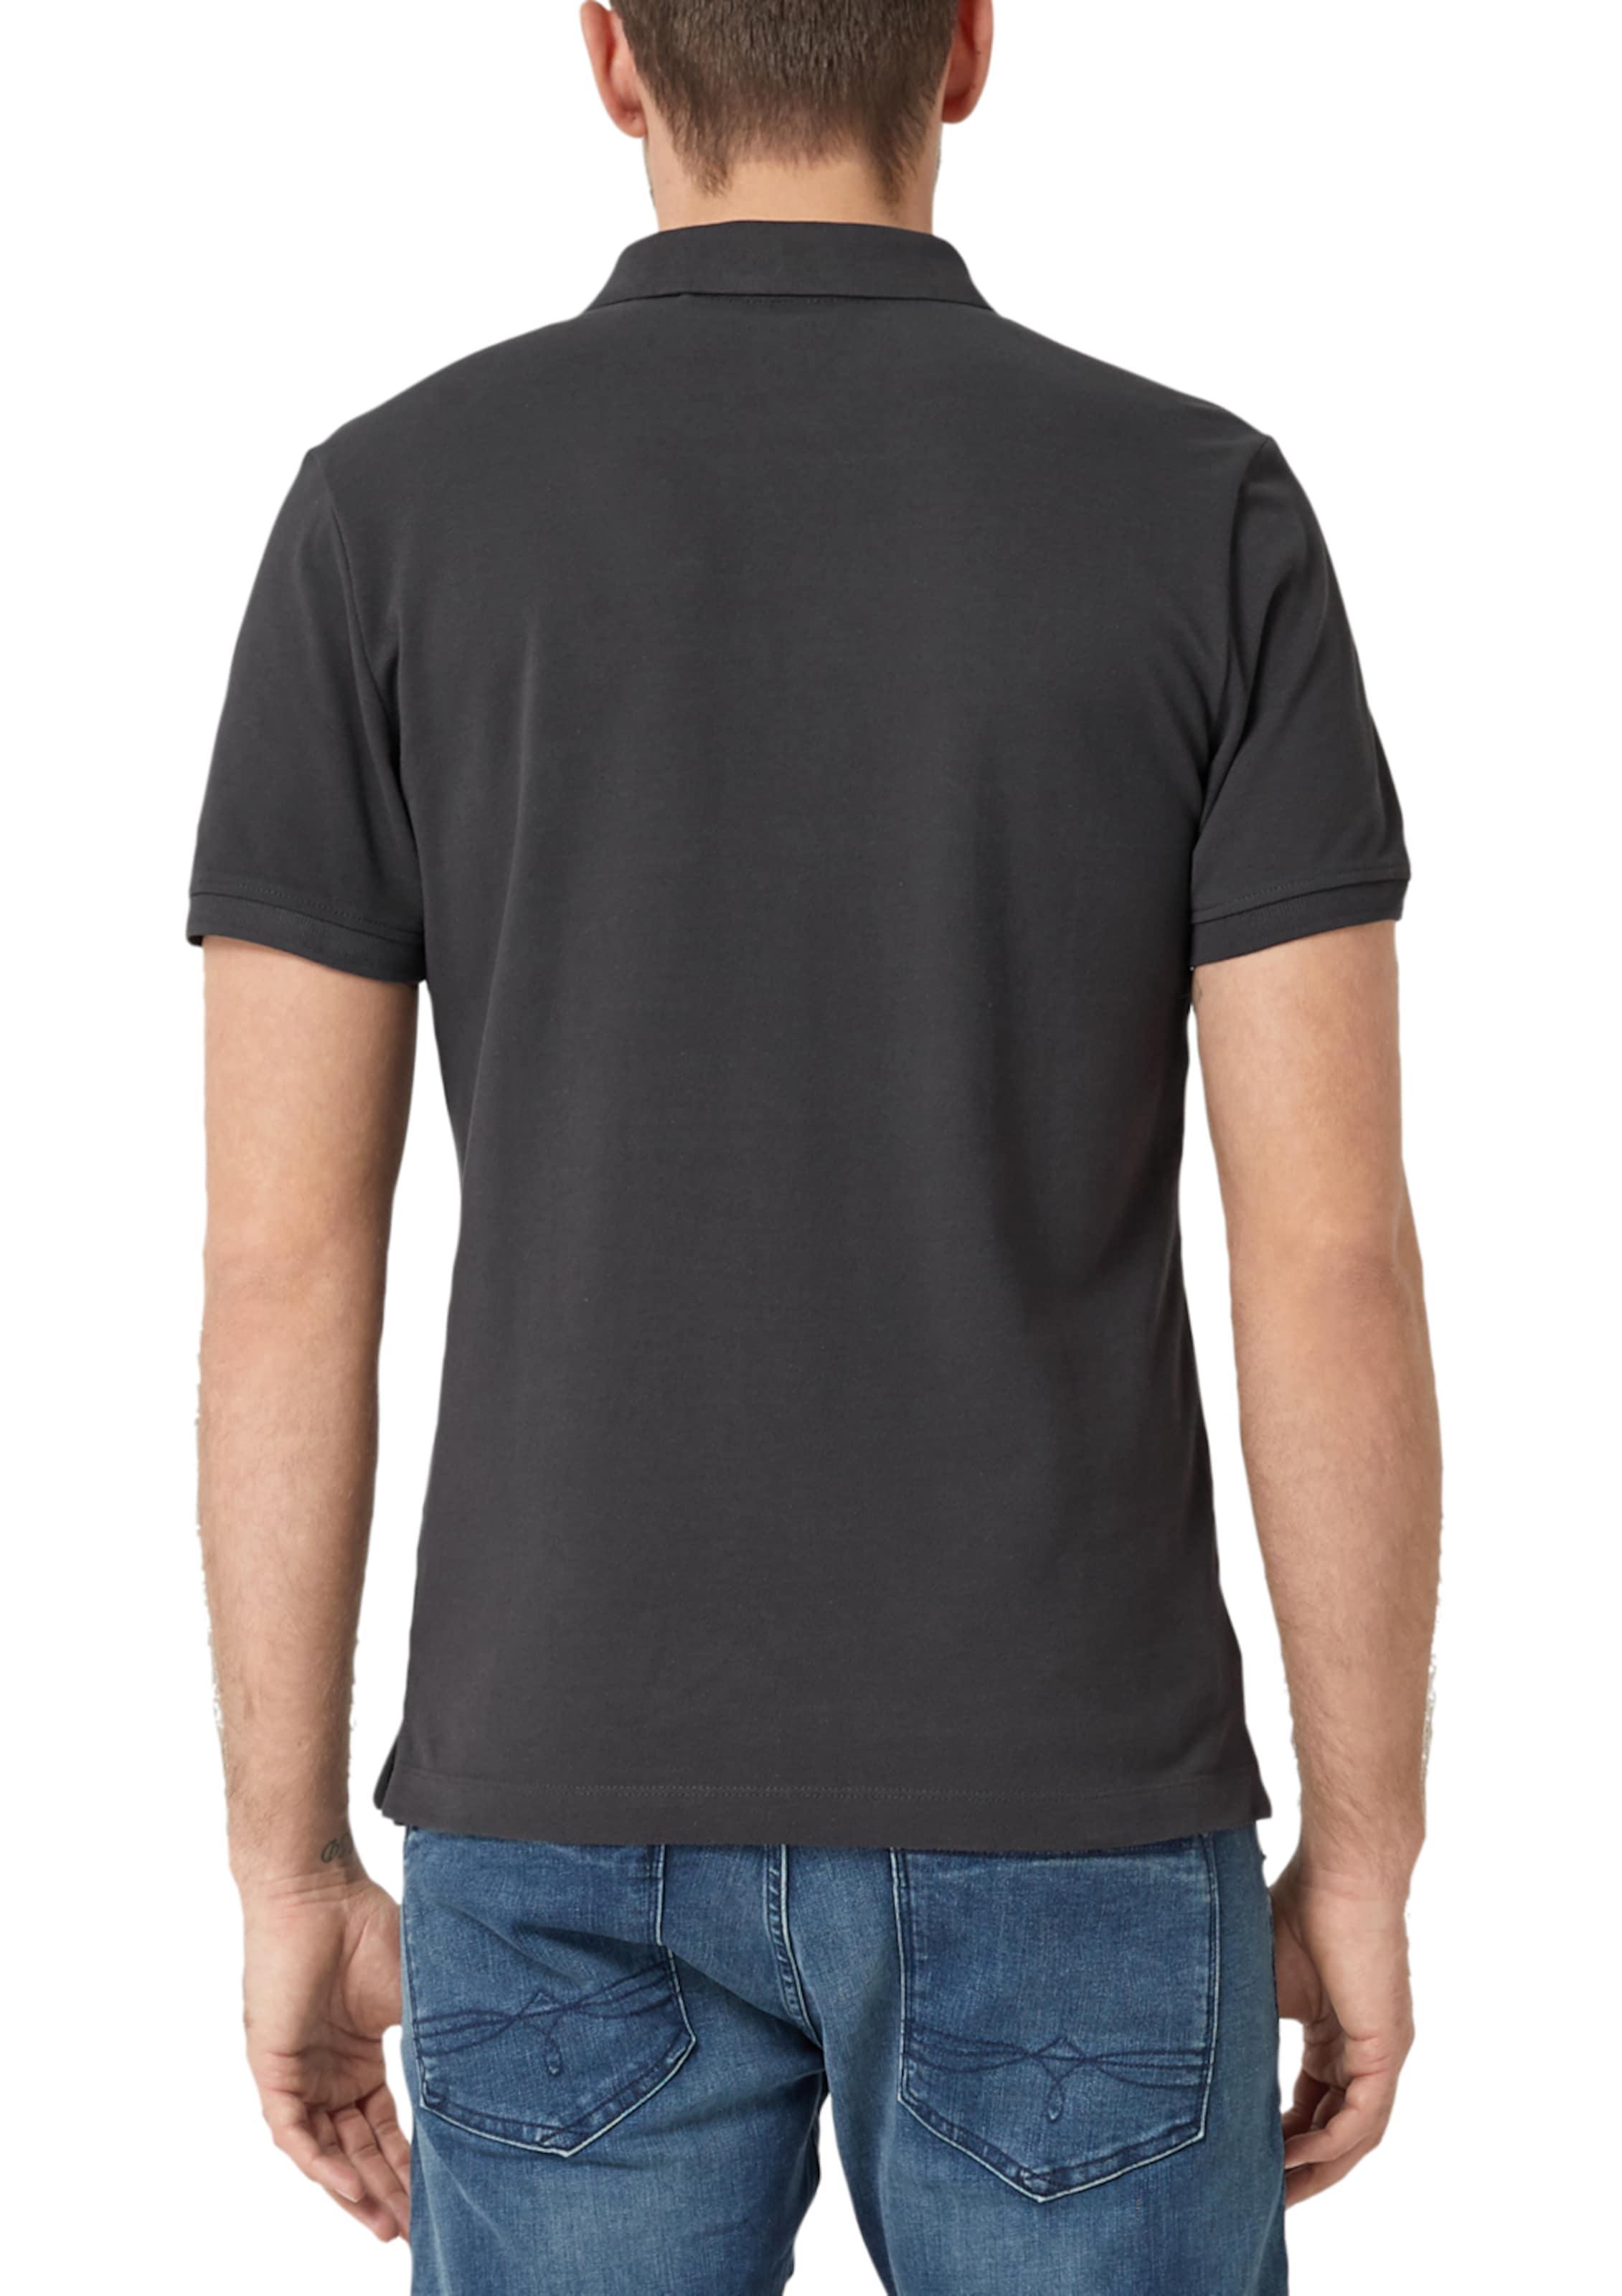 oliver Red Schwarzmeliert Shirt S Label In 54ARjL